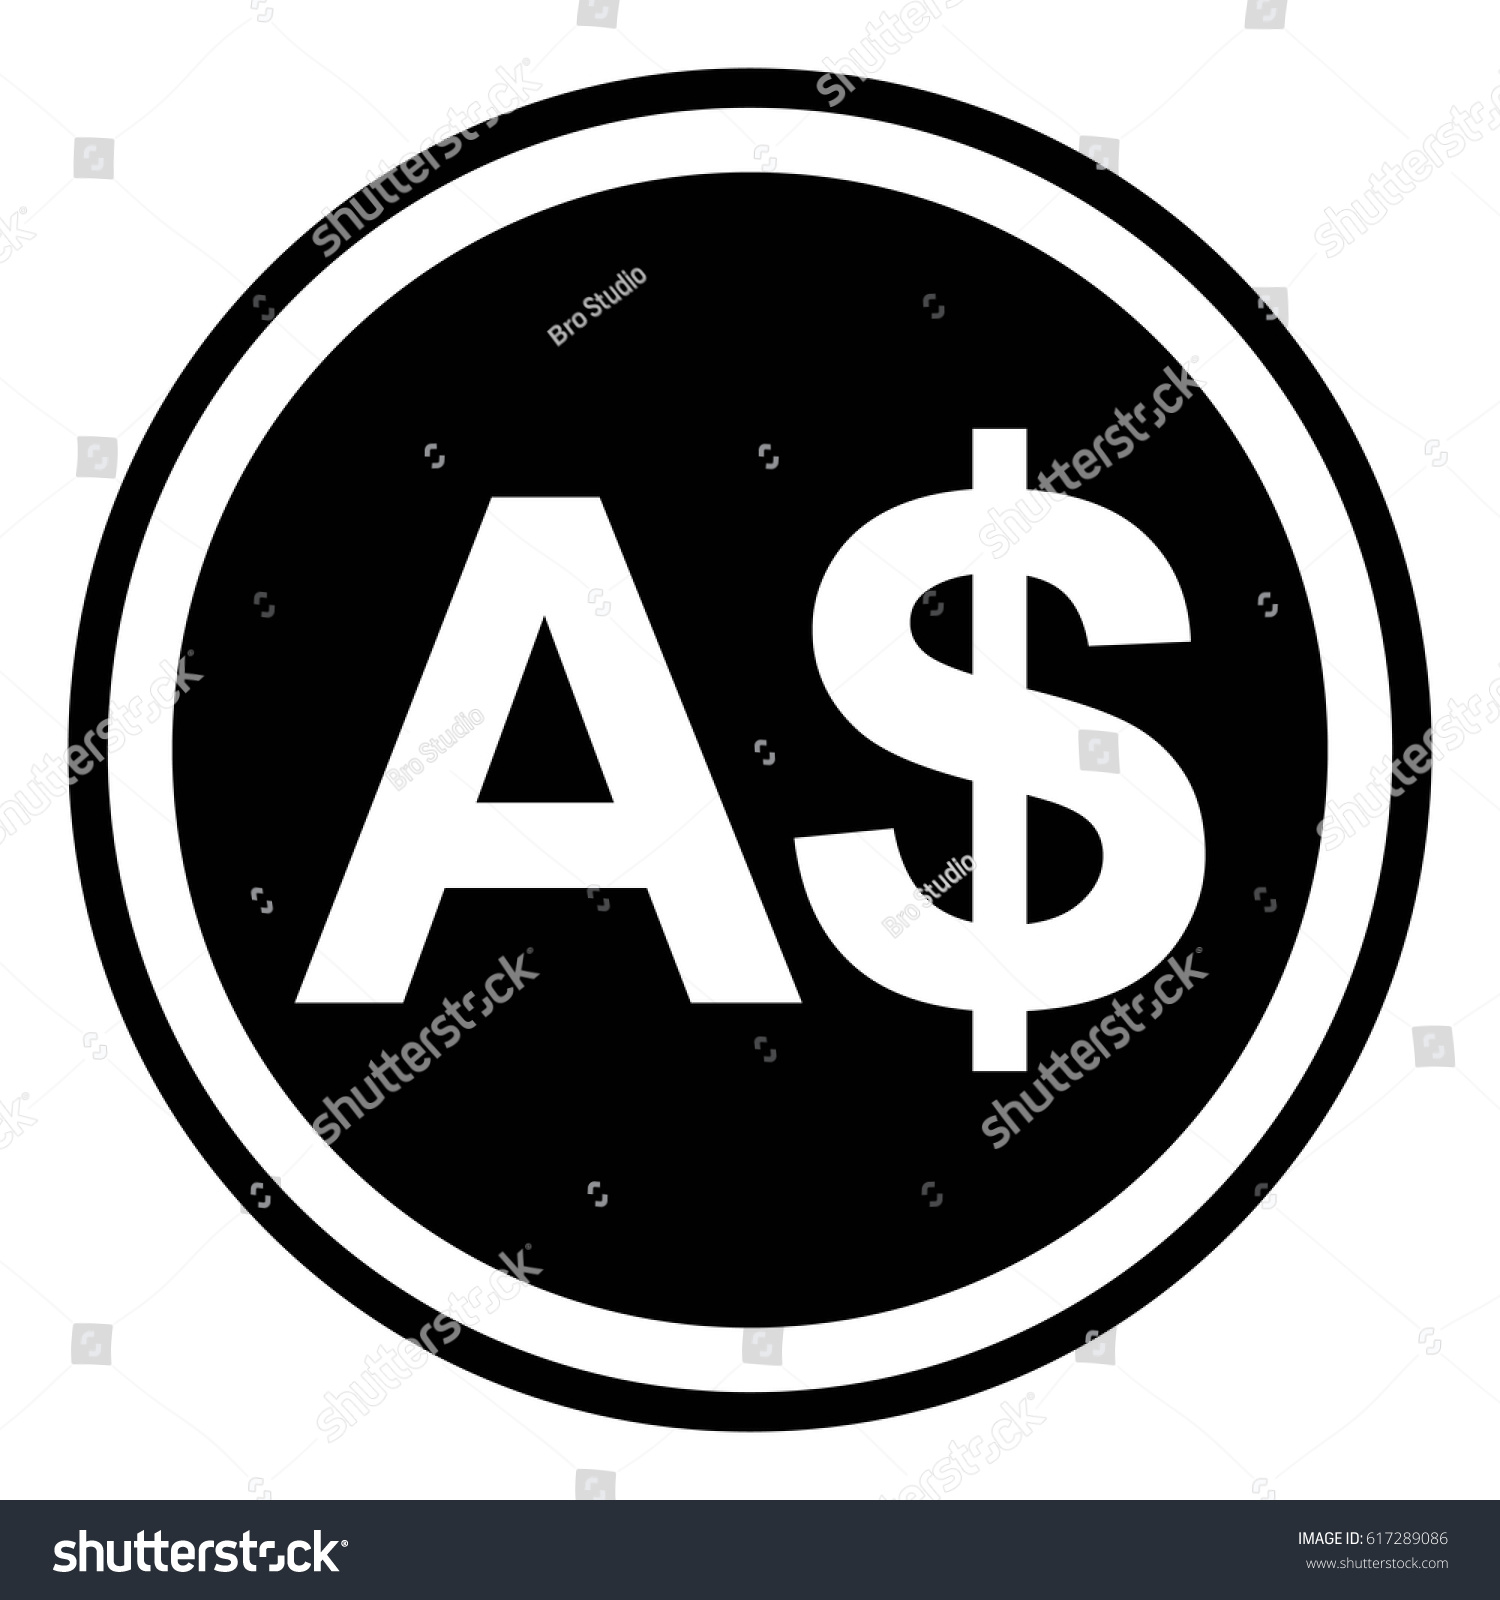 Sign currency australia australian dollar vector stock vector sign currency australia australian dollar vector dollar sign biocorpaavc Image collections